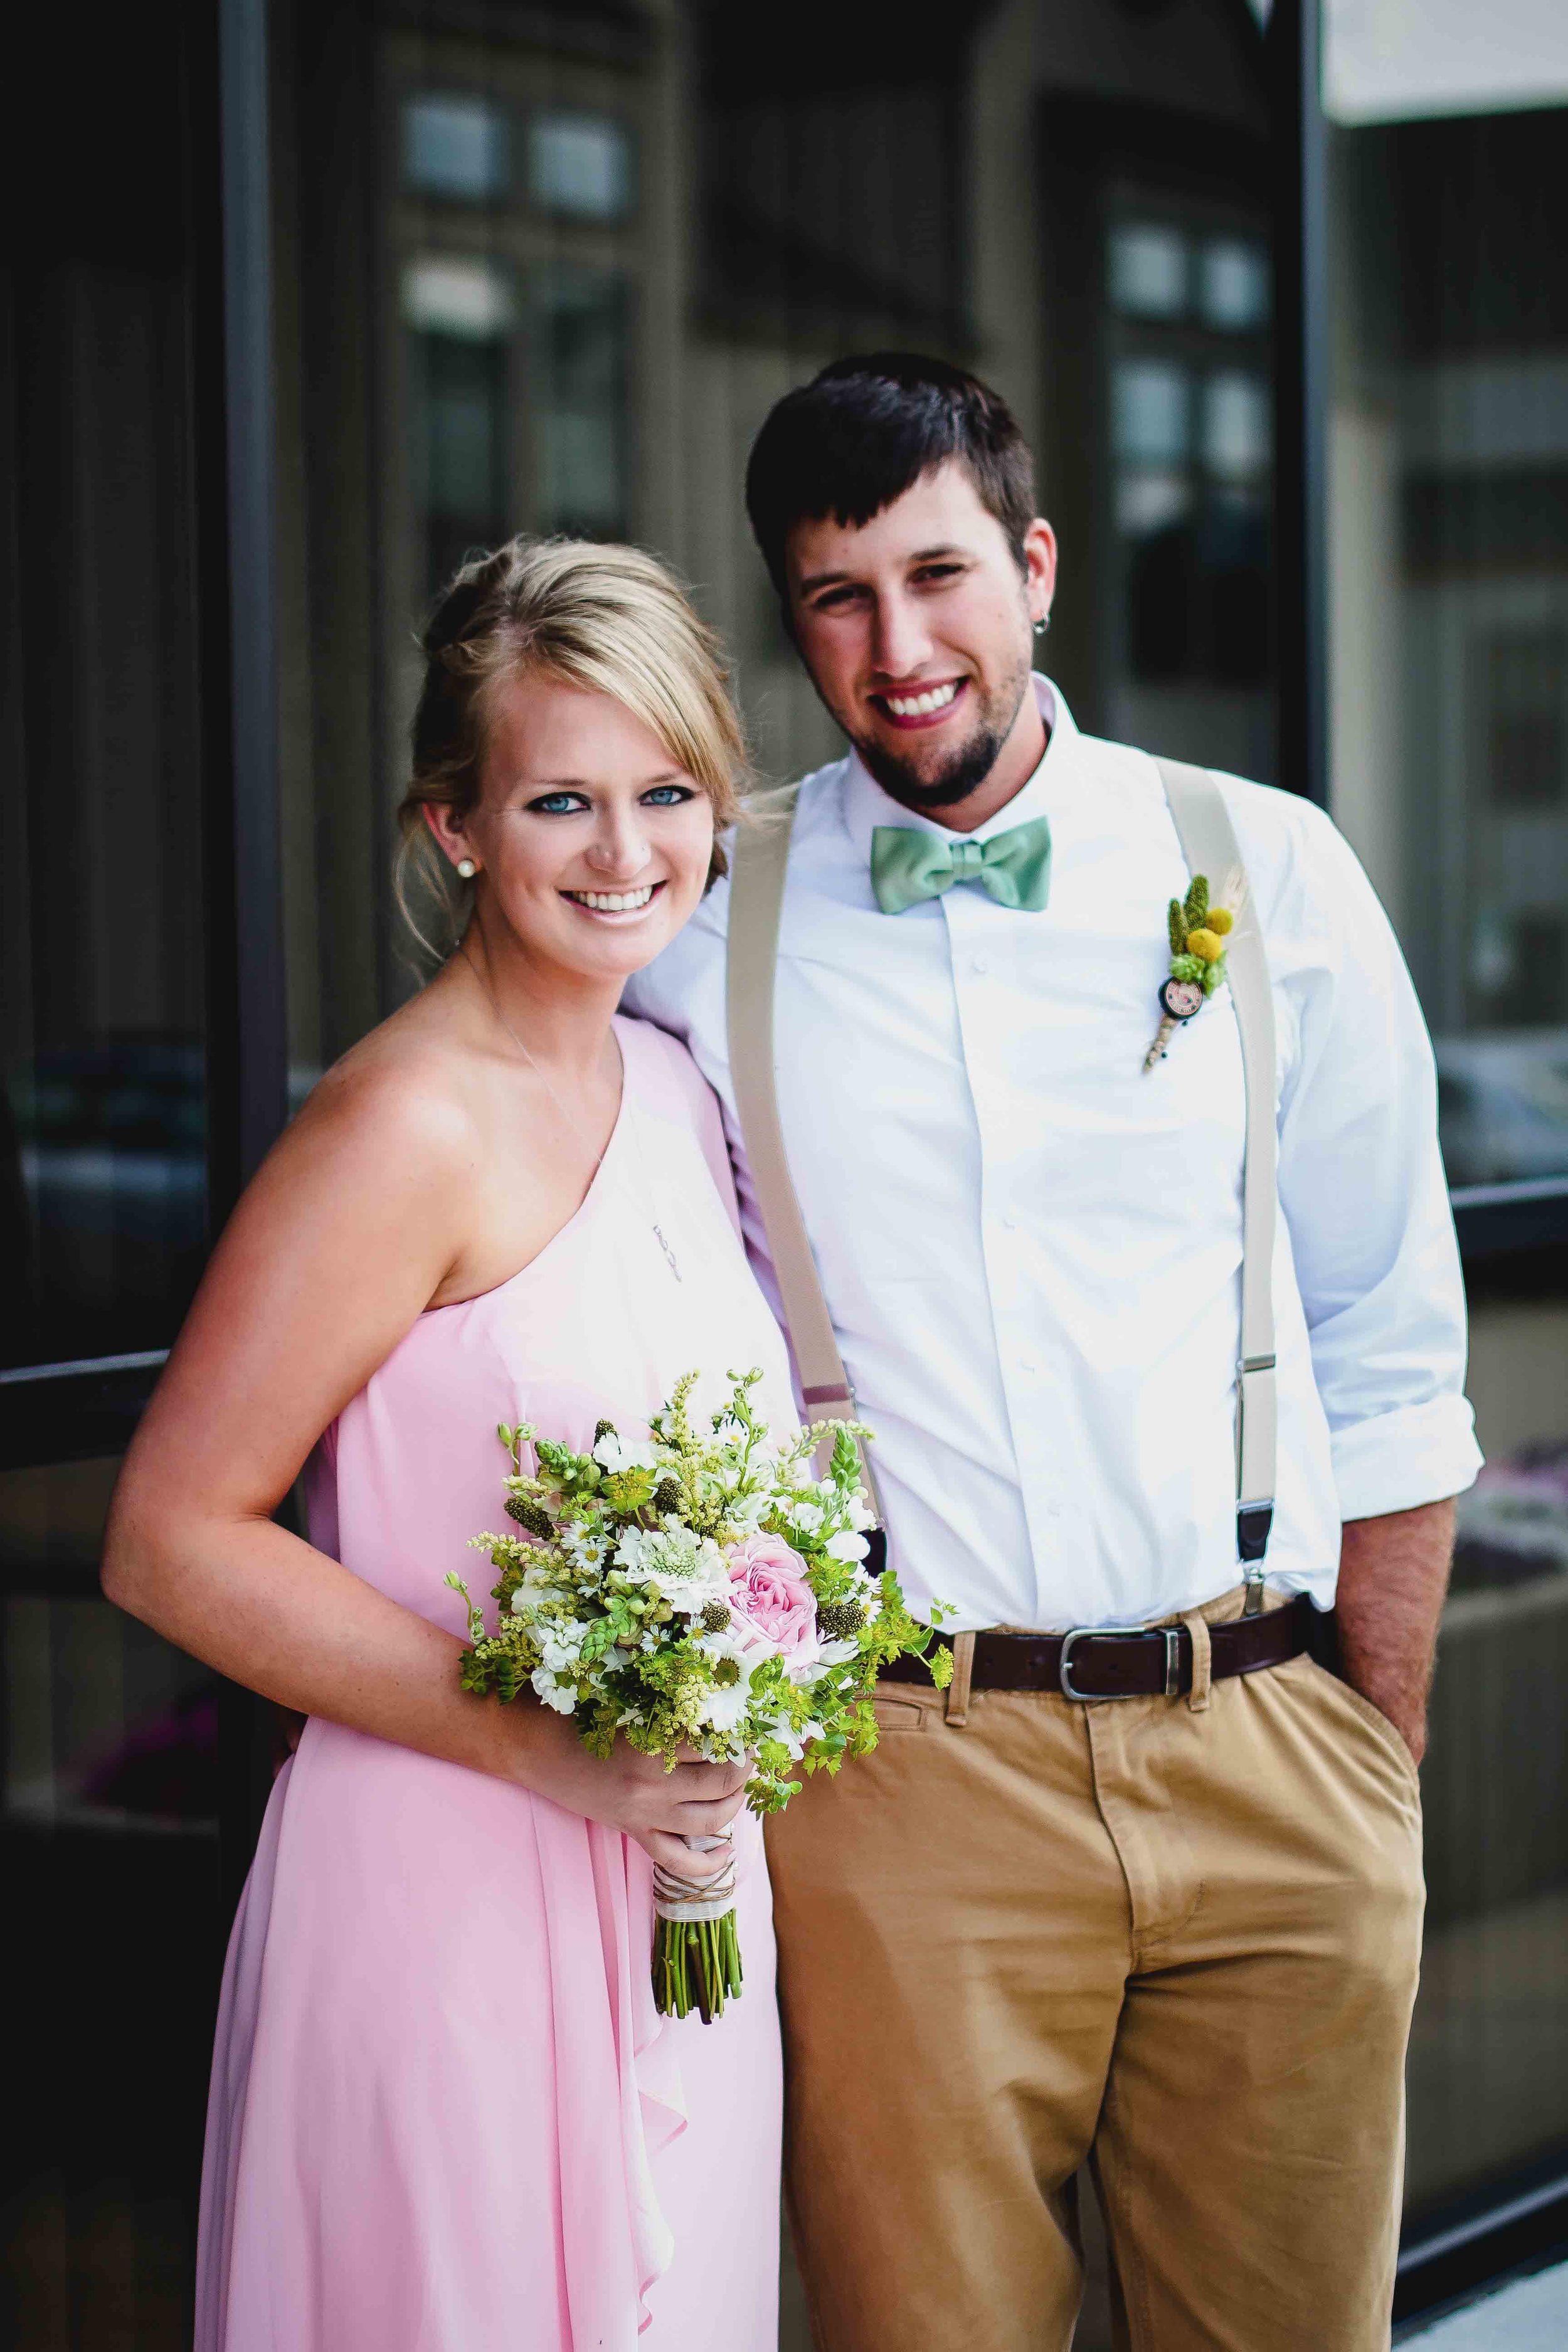 abcde wedding (102)_edited-1.jpg